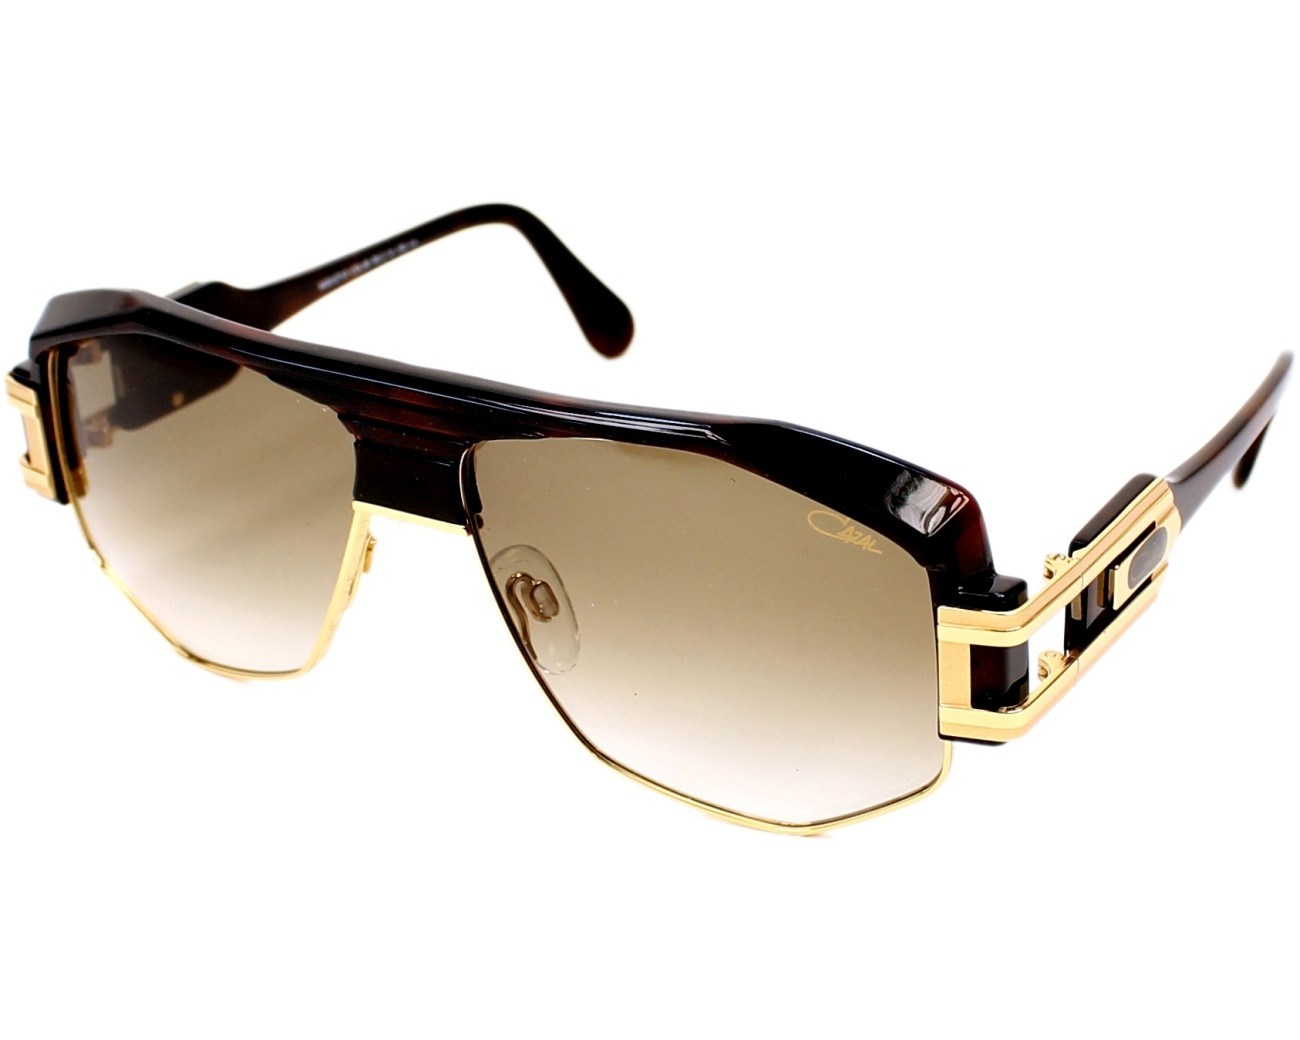 cazal sunglasses 671 3 080 59 visionet. Black Bedroom Furniture Sets. Home Design Ideas